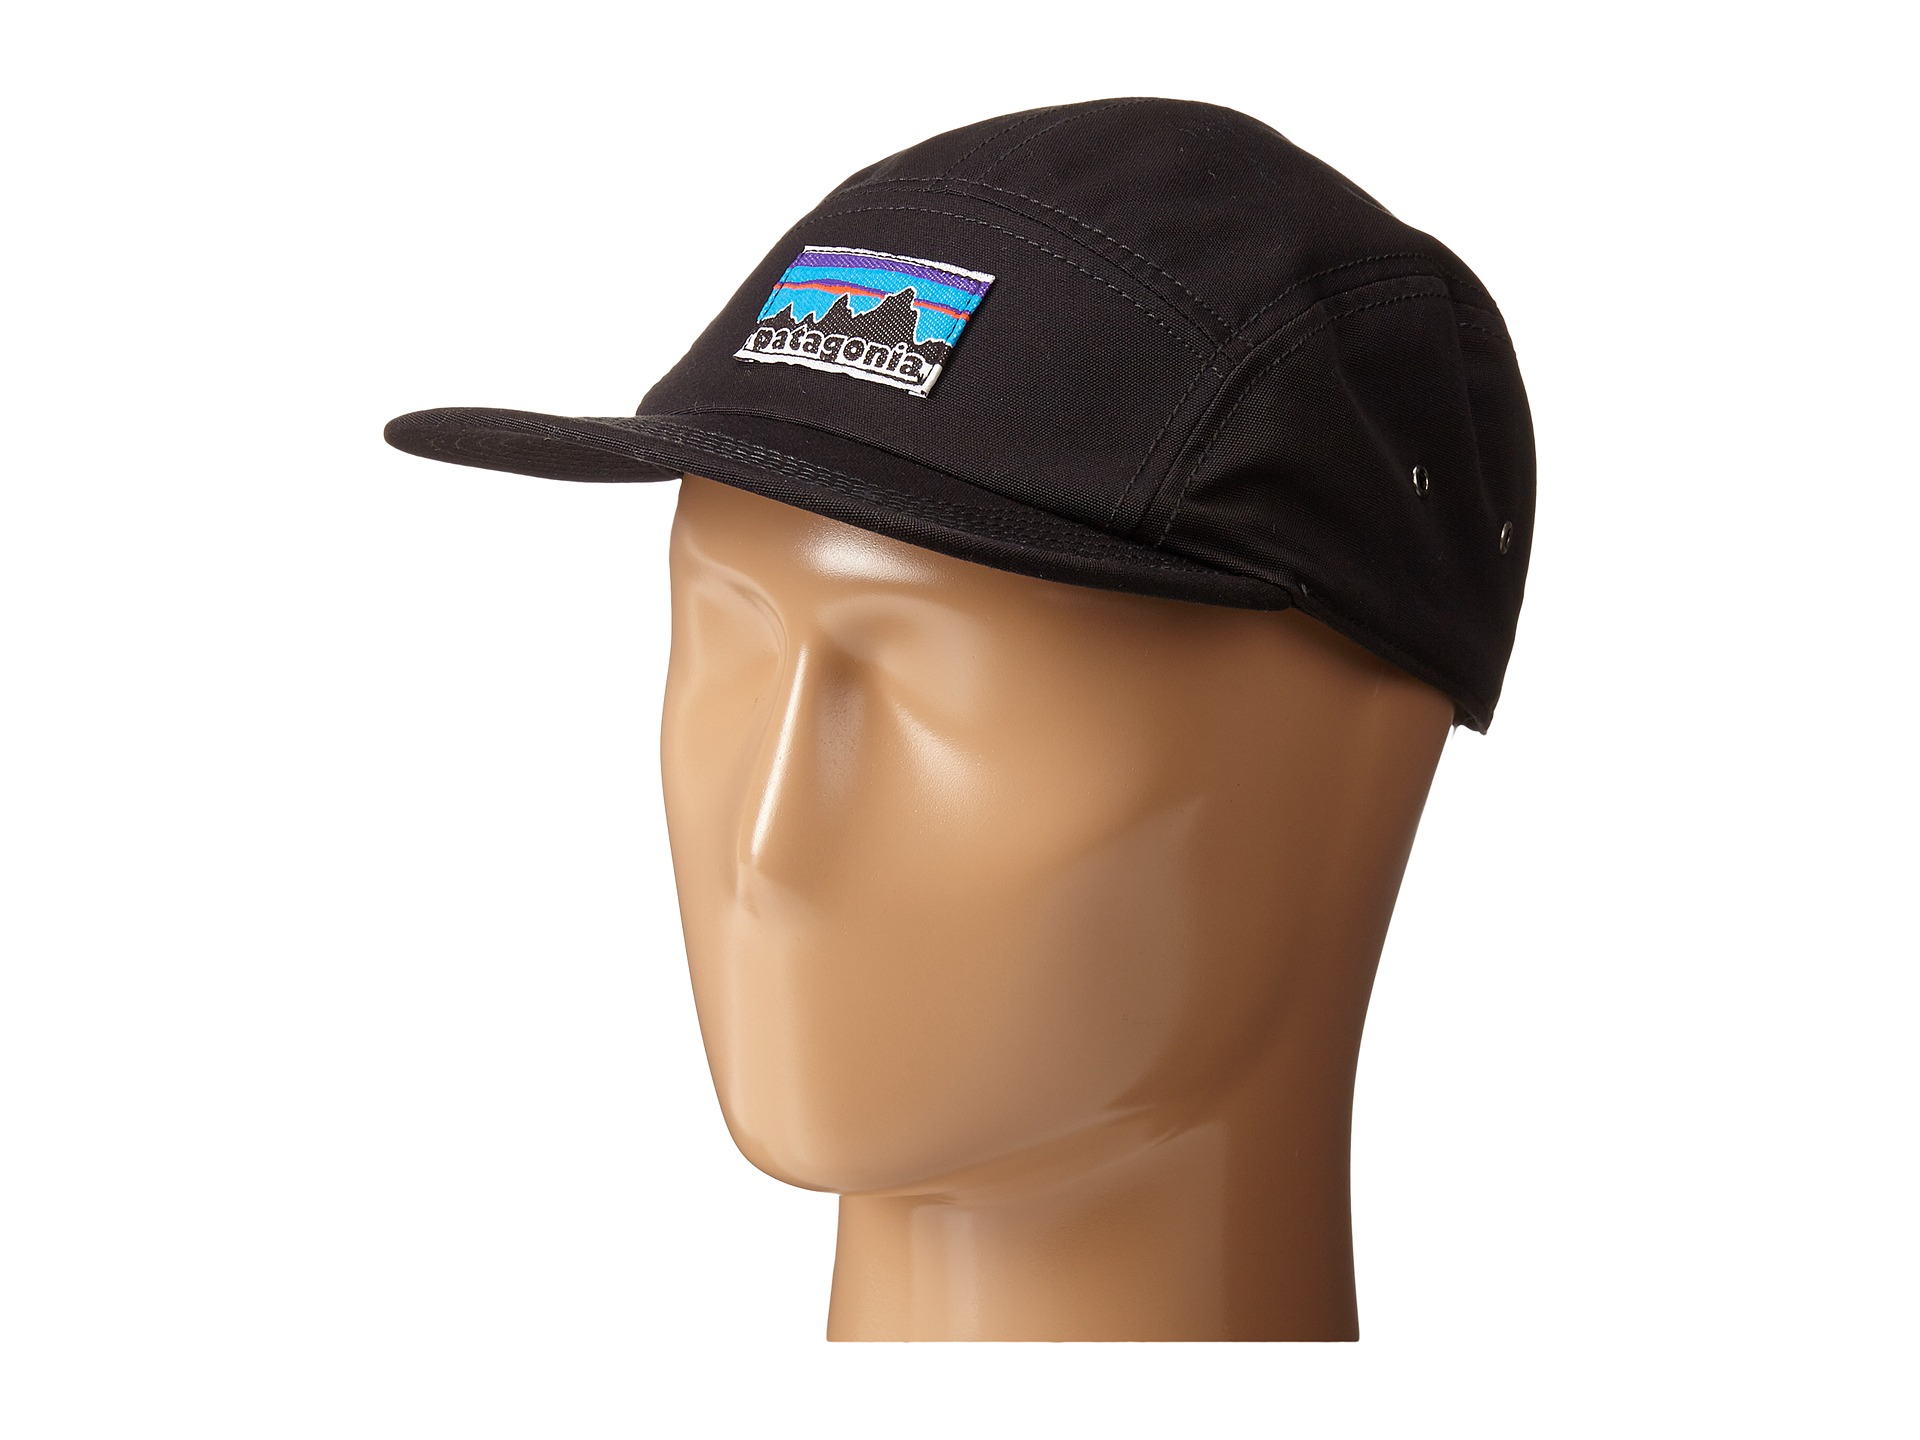 Lyst - Patagonia Retro Fitz Roy Label Tradesmith Cap in Black 587386260705